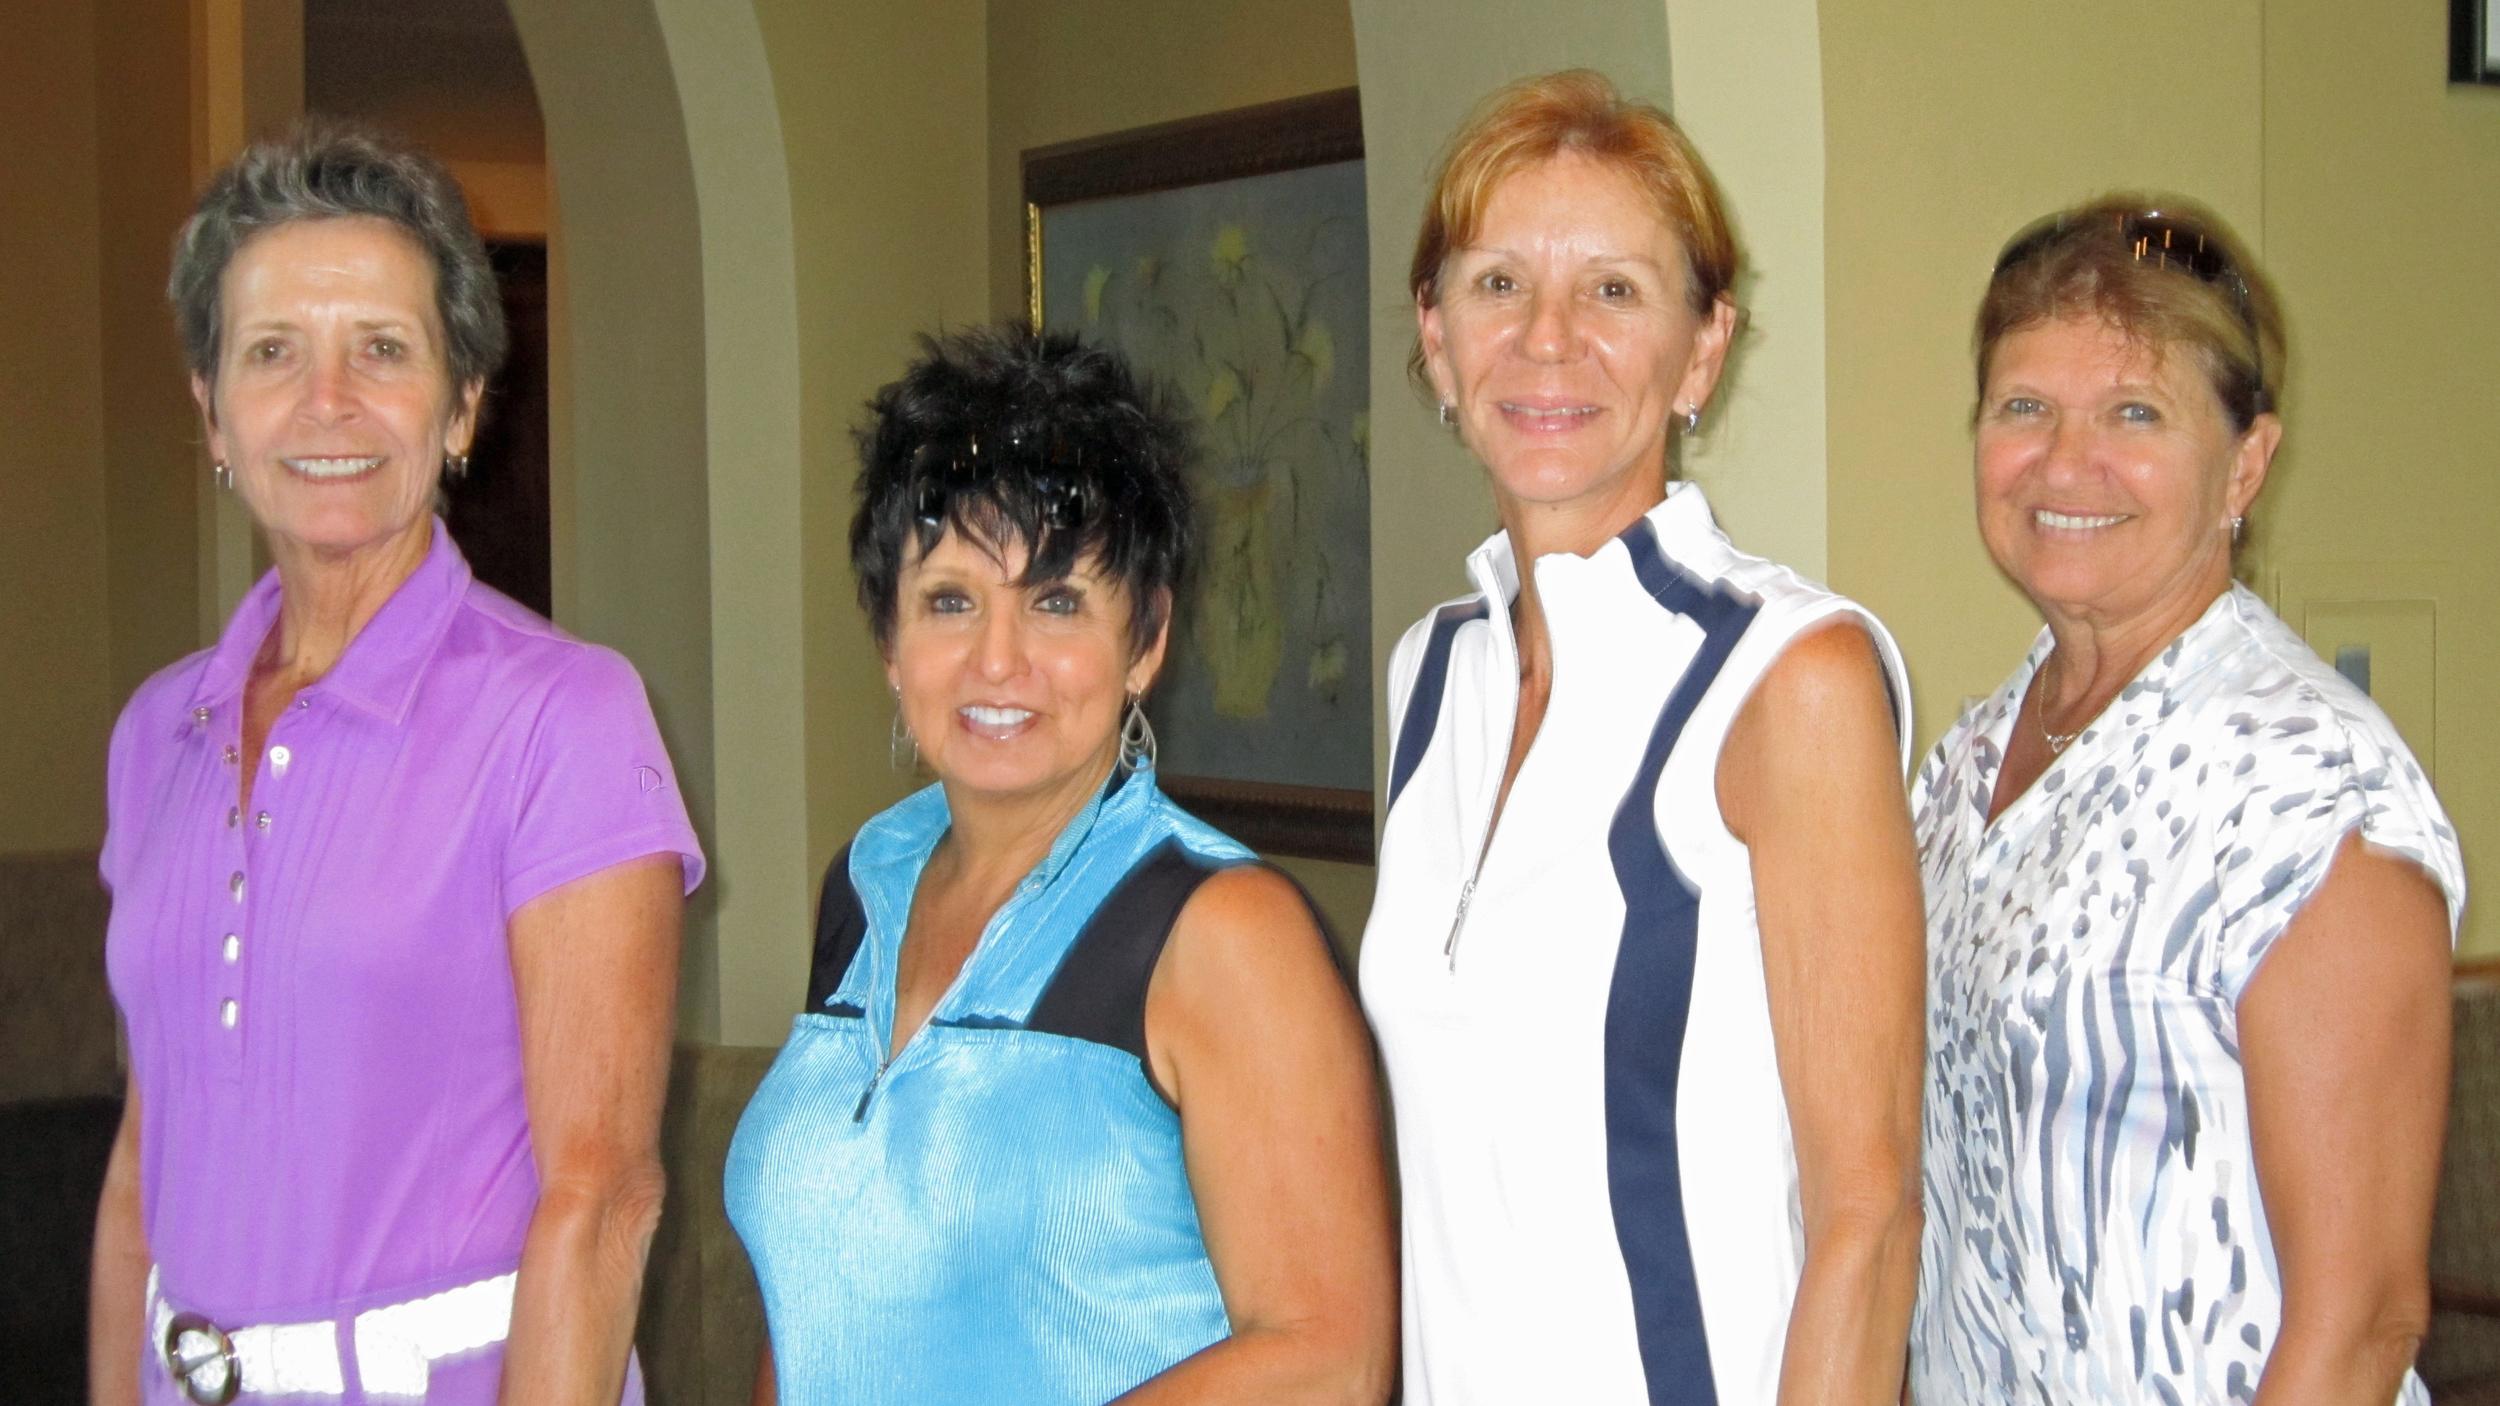 Valerie Klosterman, Linda Russell, Cathy Wright, and Karen Truono